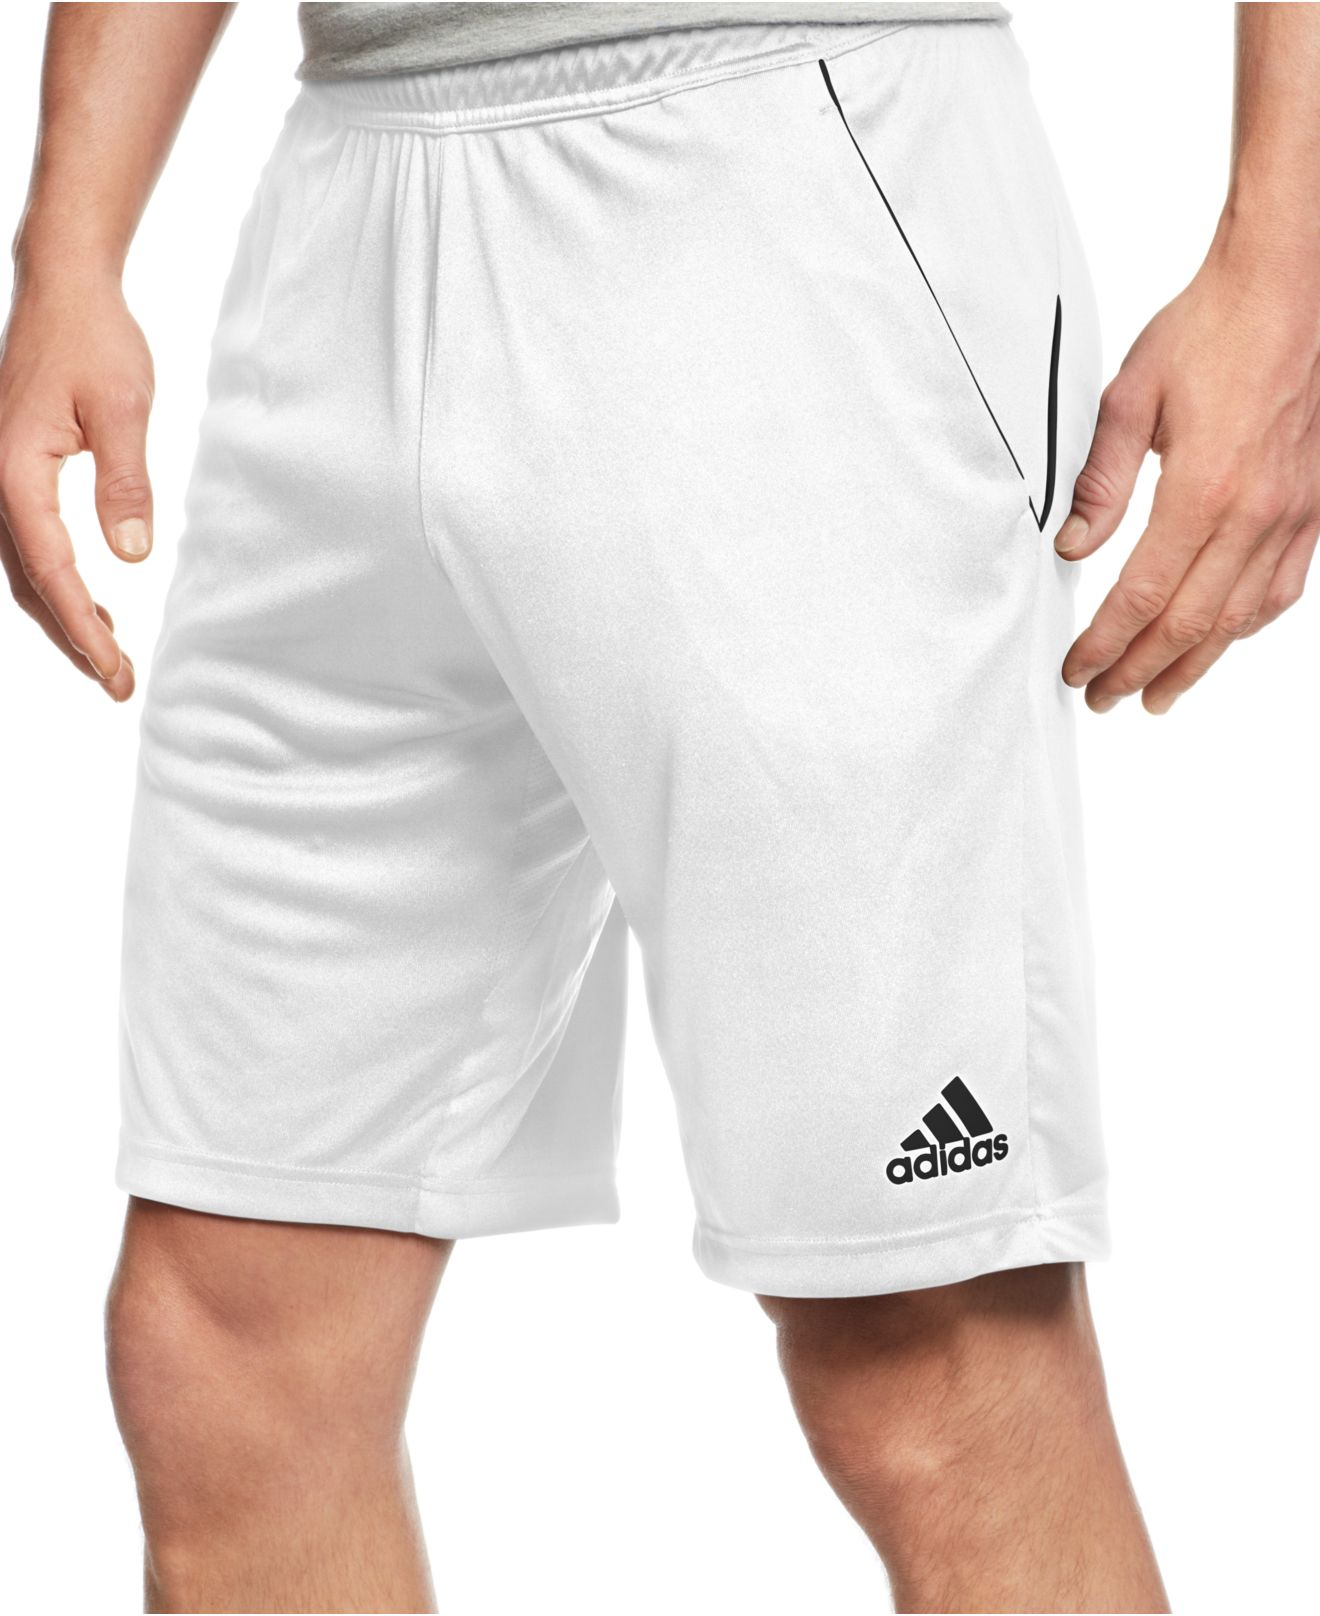 For Adizero Performance Tennis Men Shorts Adidas White f6Ybyg7